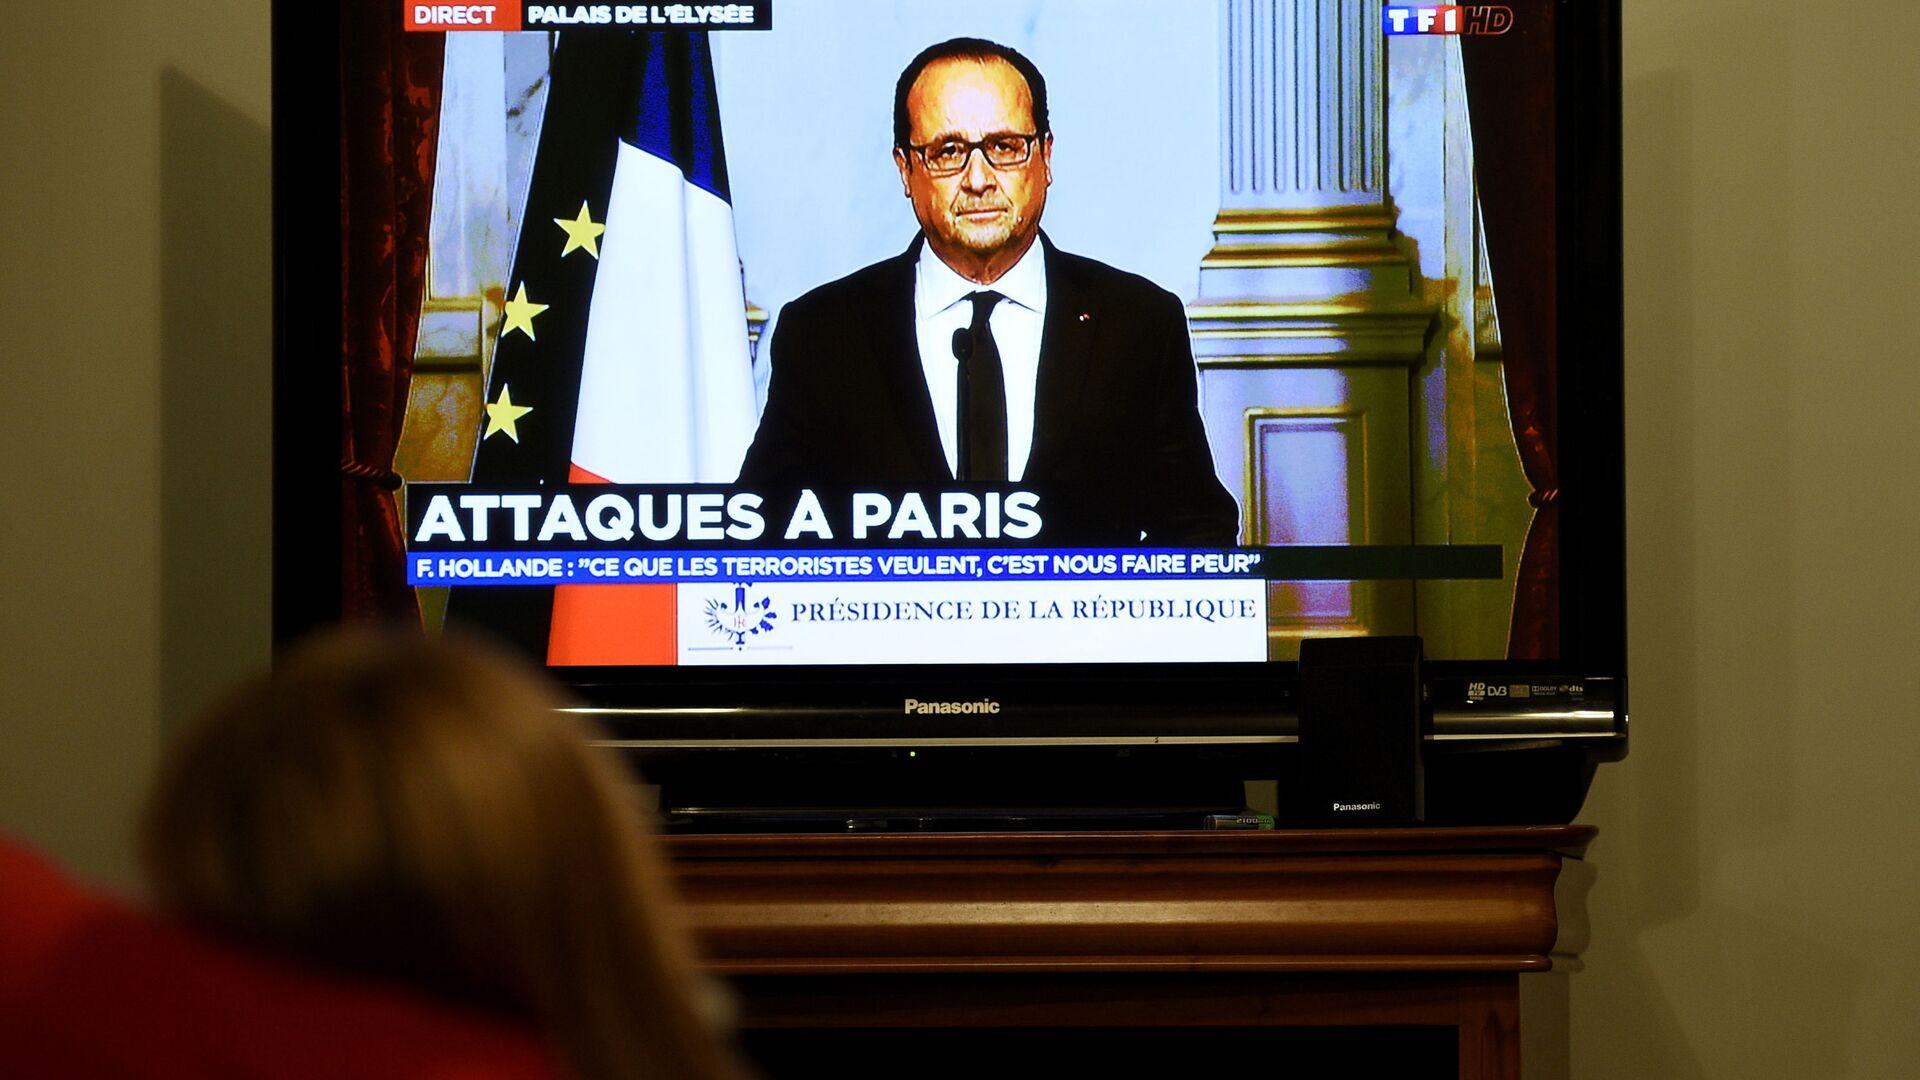 Обращение президента Франции Франсуа Олланда к нации, после серии терактов в Париже - Sputnik Узбекистан, 1920, 08.09.2021